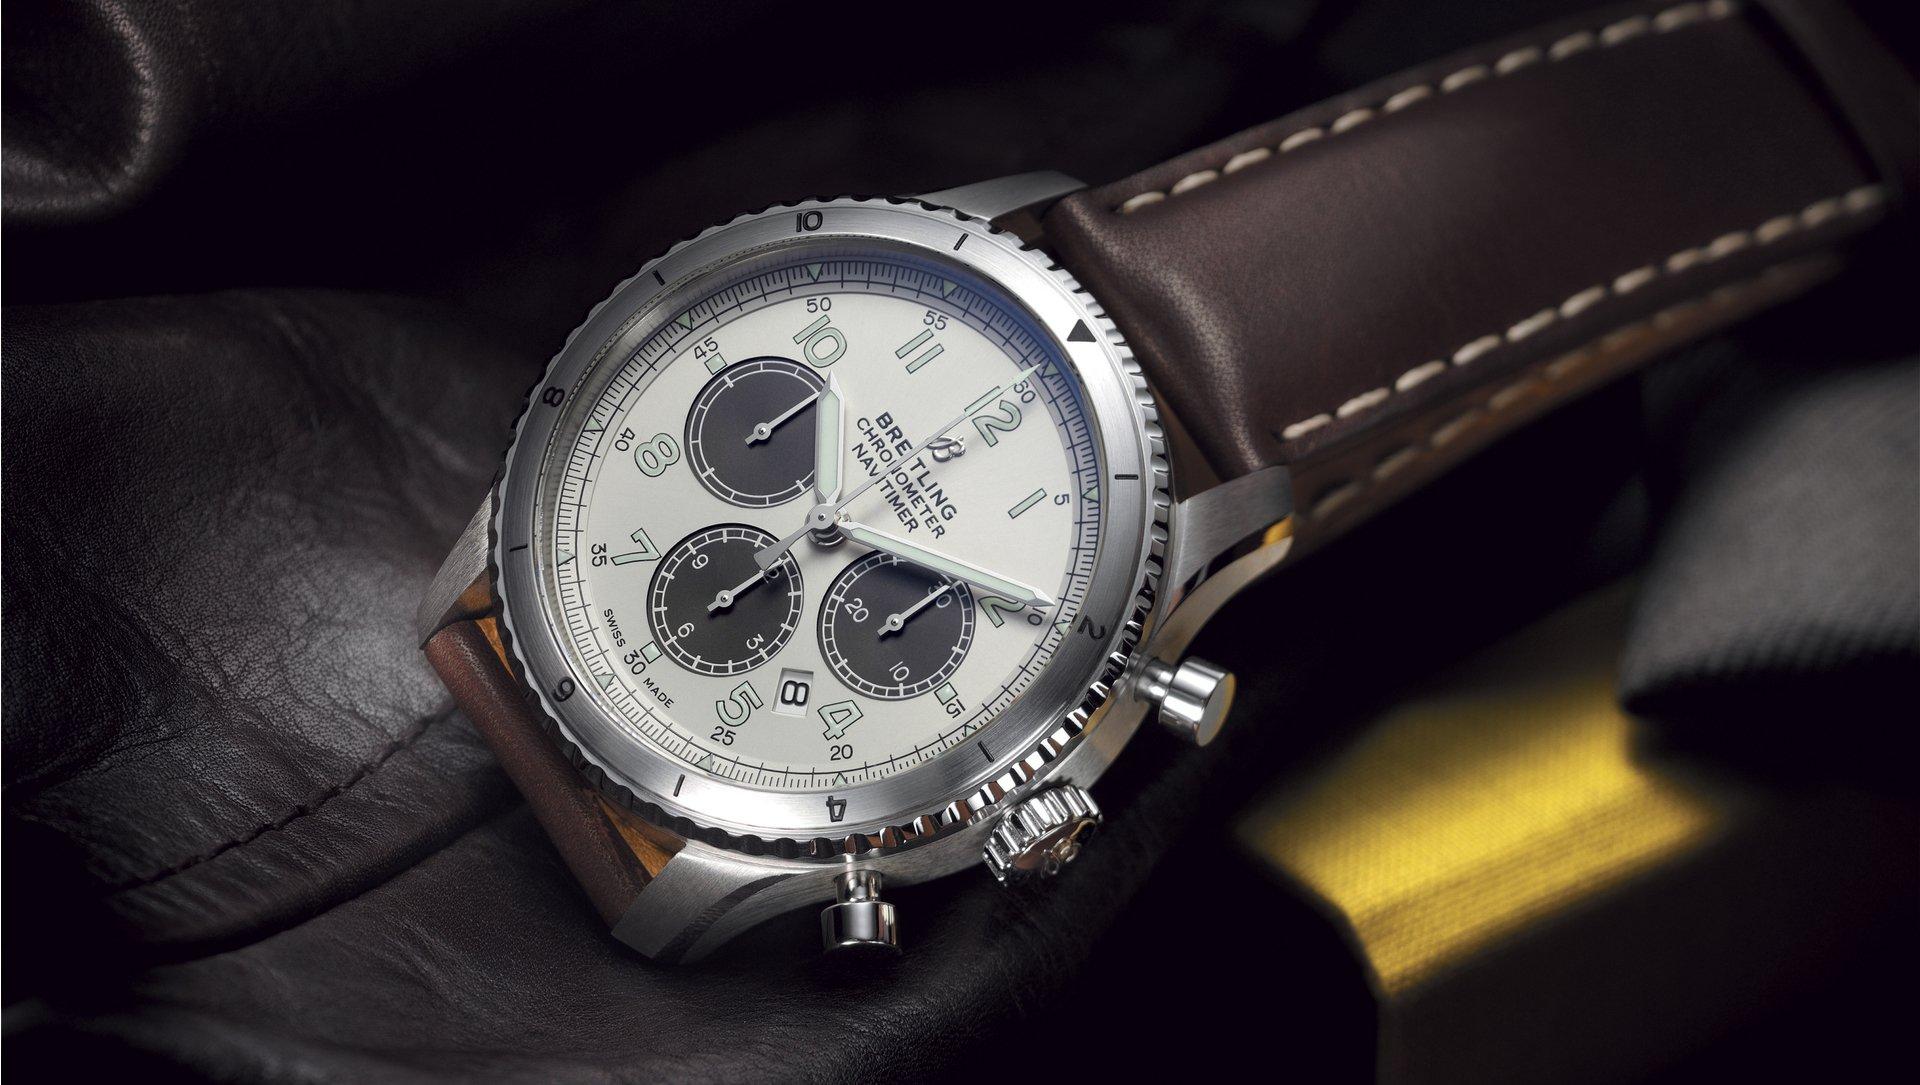 Cartier Santos 100 Xl With Diamonds - Replica Watch